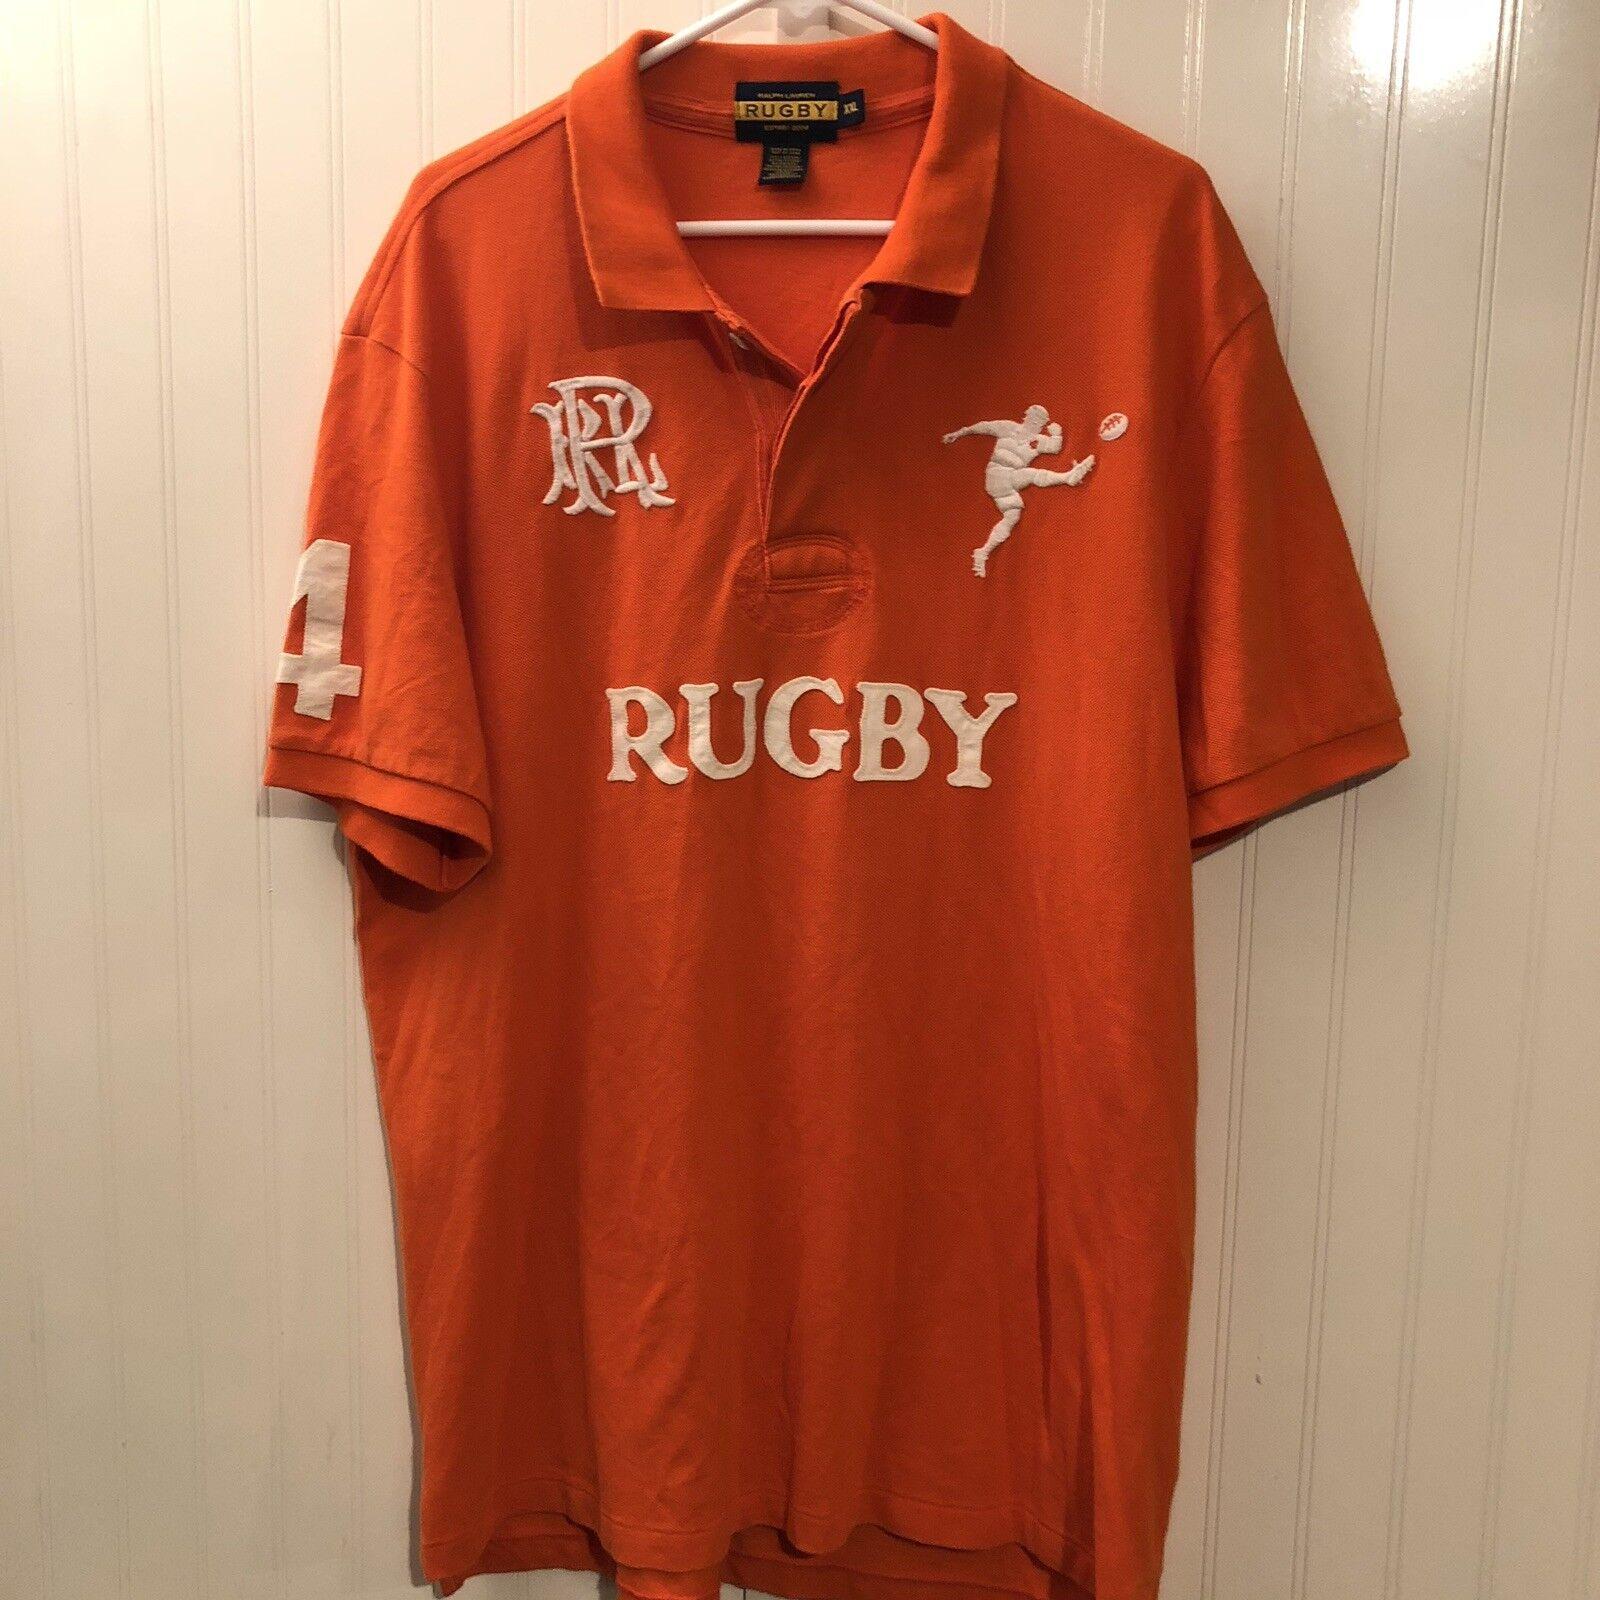 RARE Rugby Ralph Lauren Spellout Polo Shirt Button Up XXL 2xl Vintage